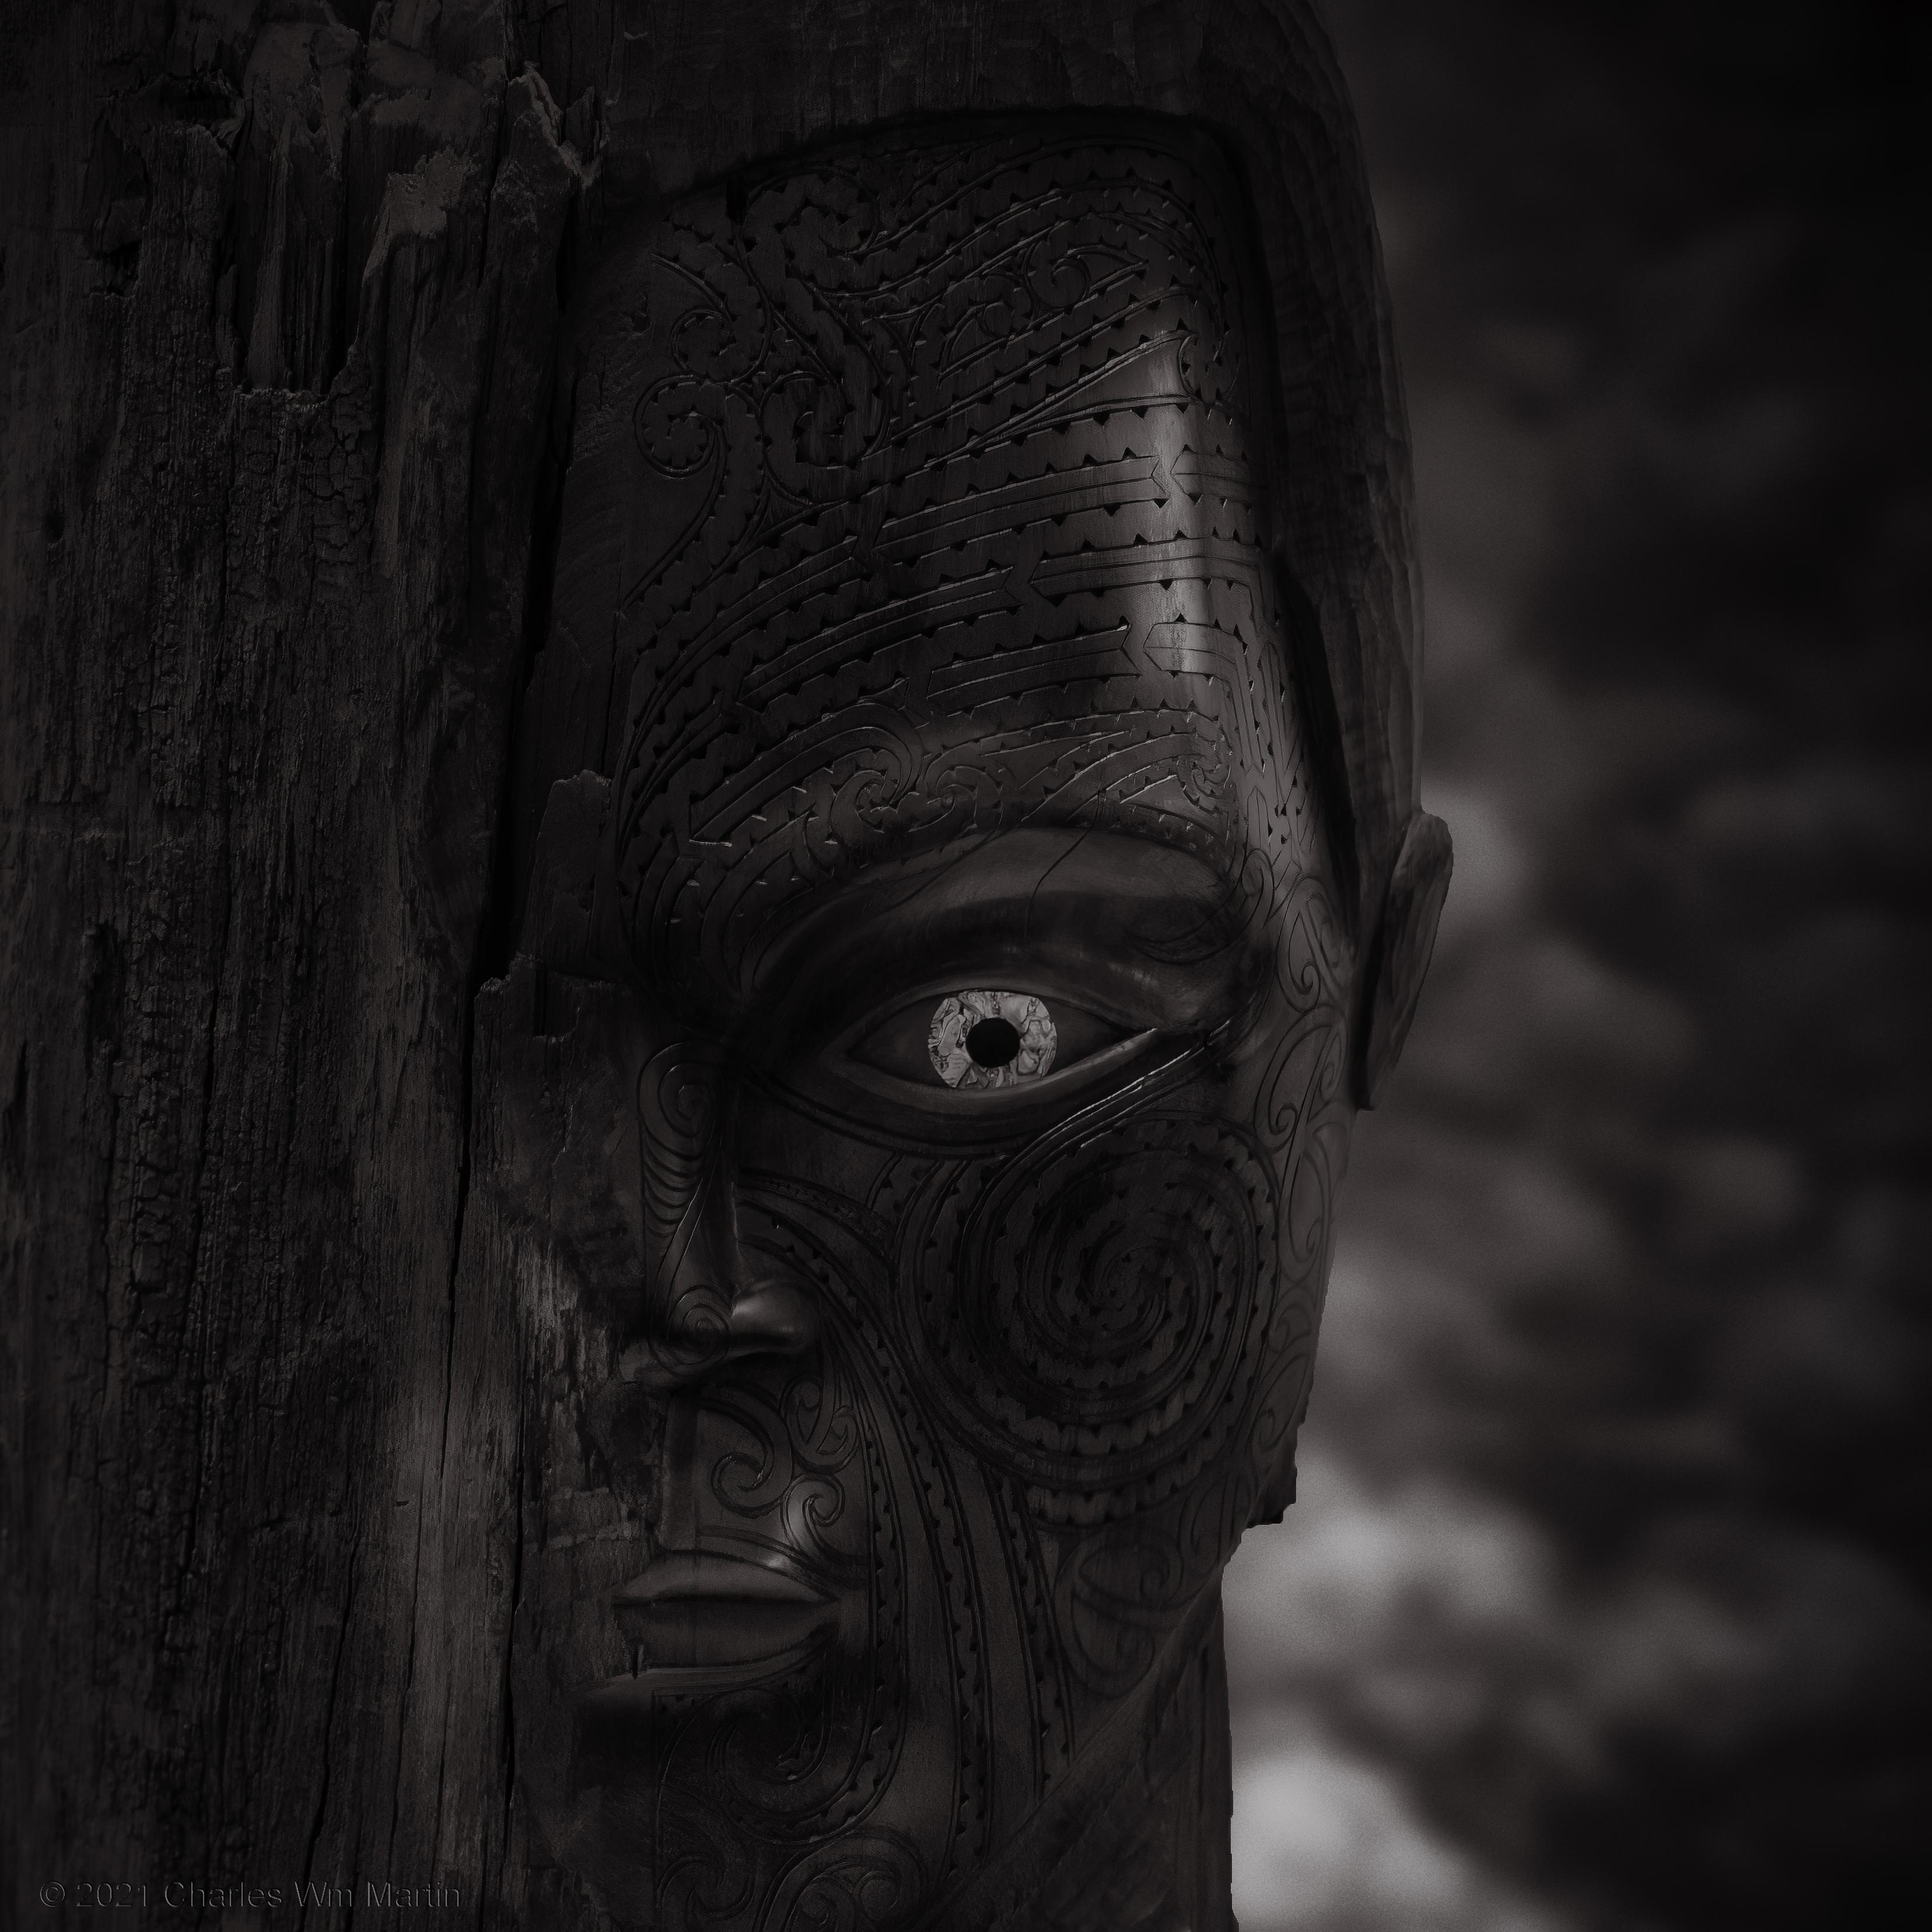 embedded nightmares